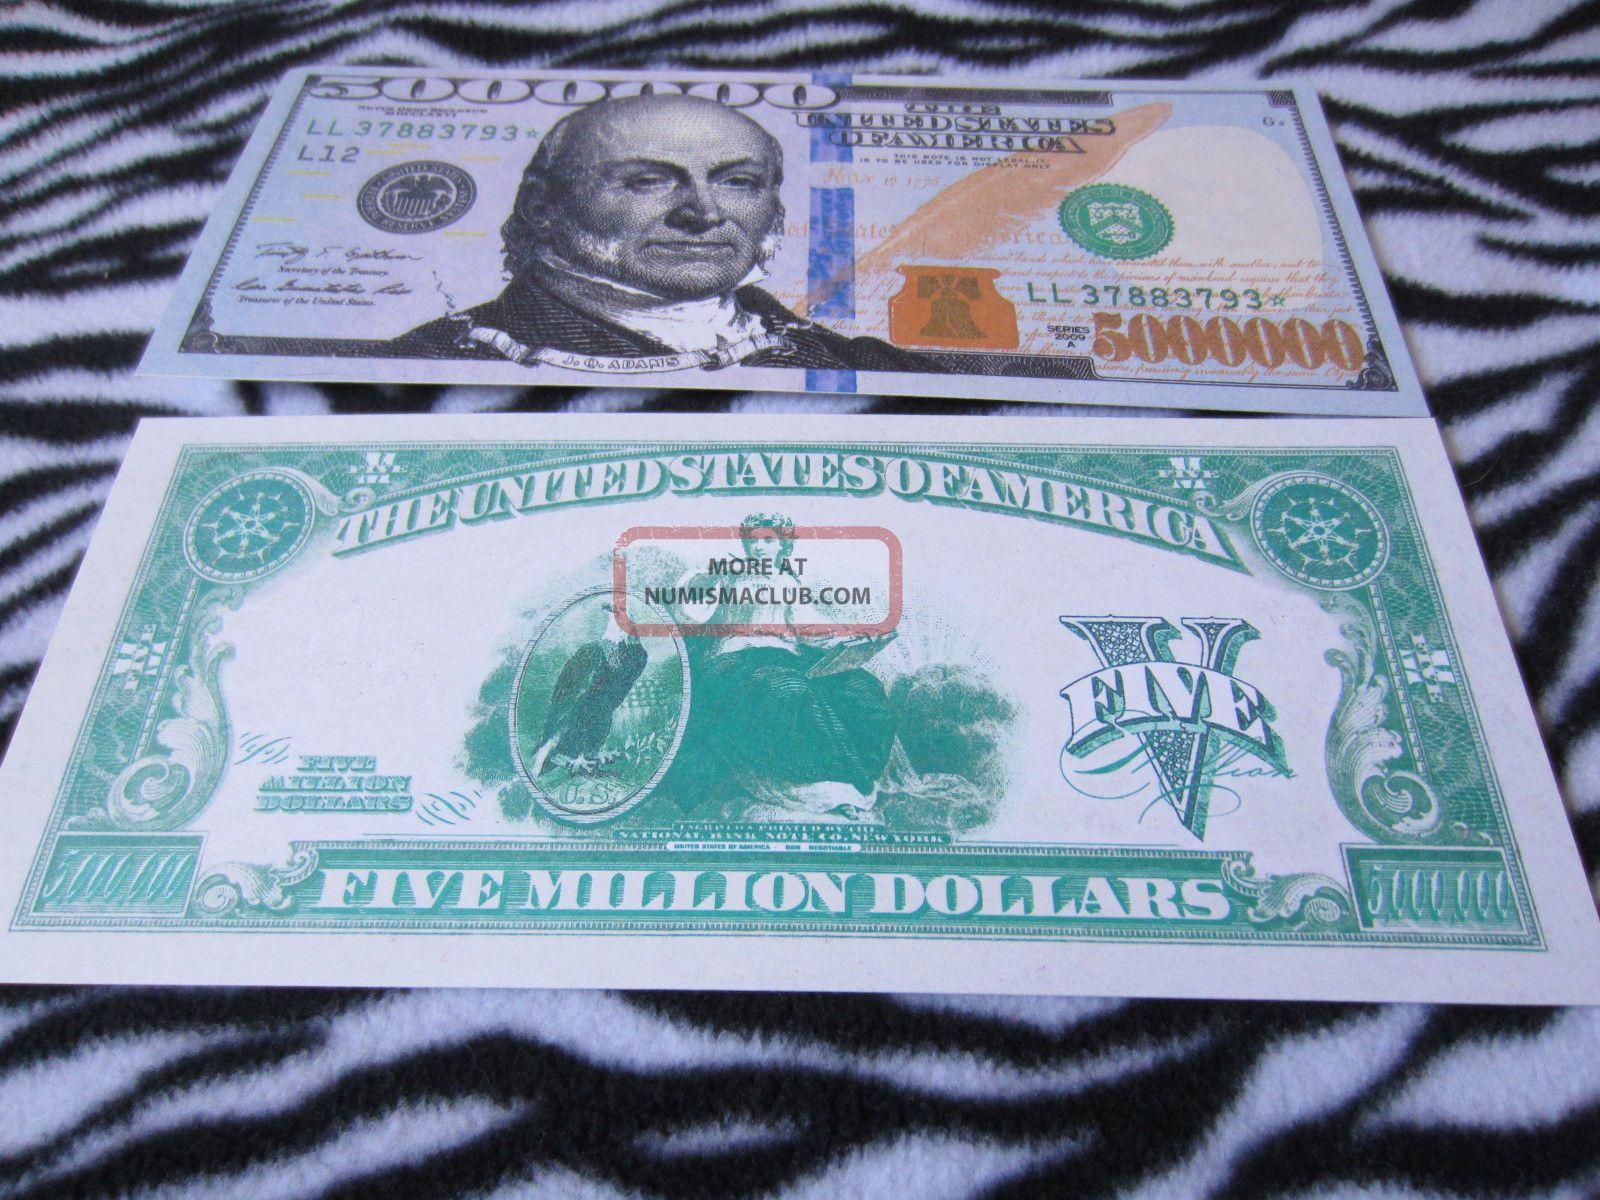 5000000 dollars